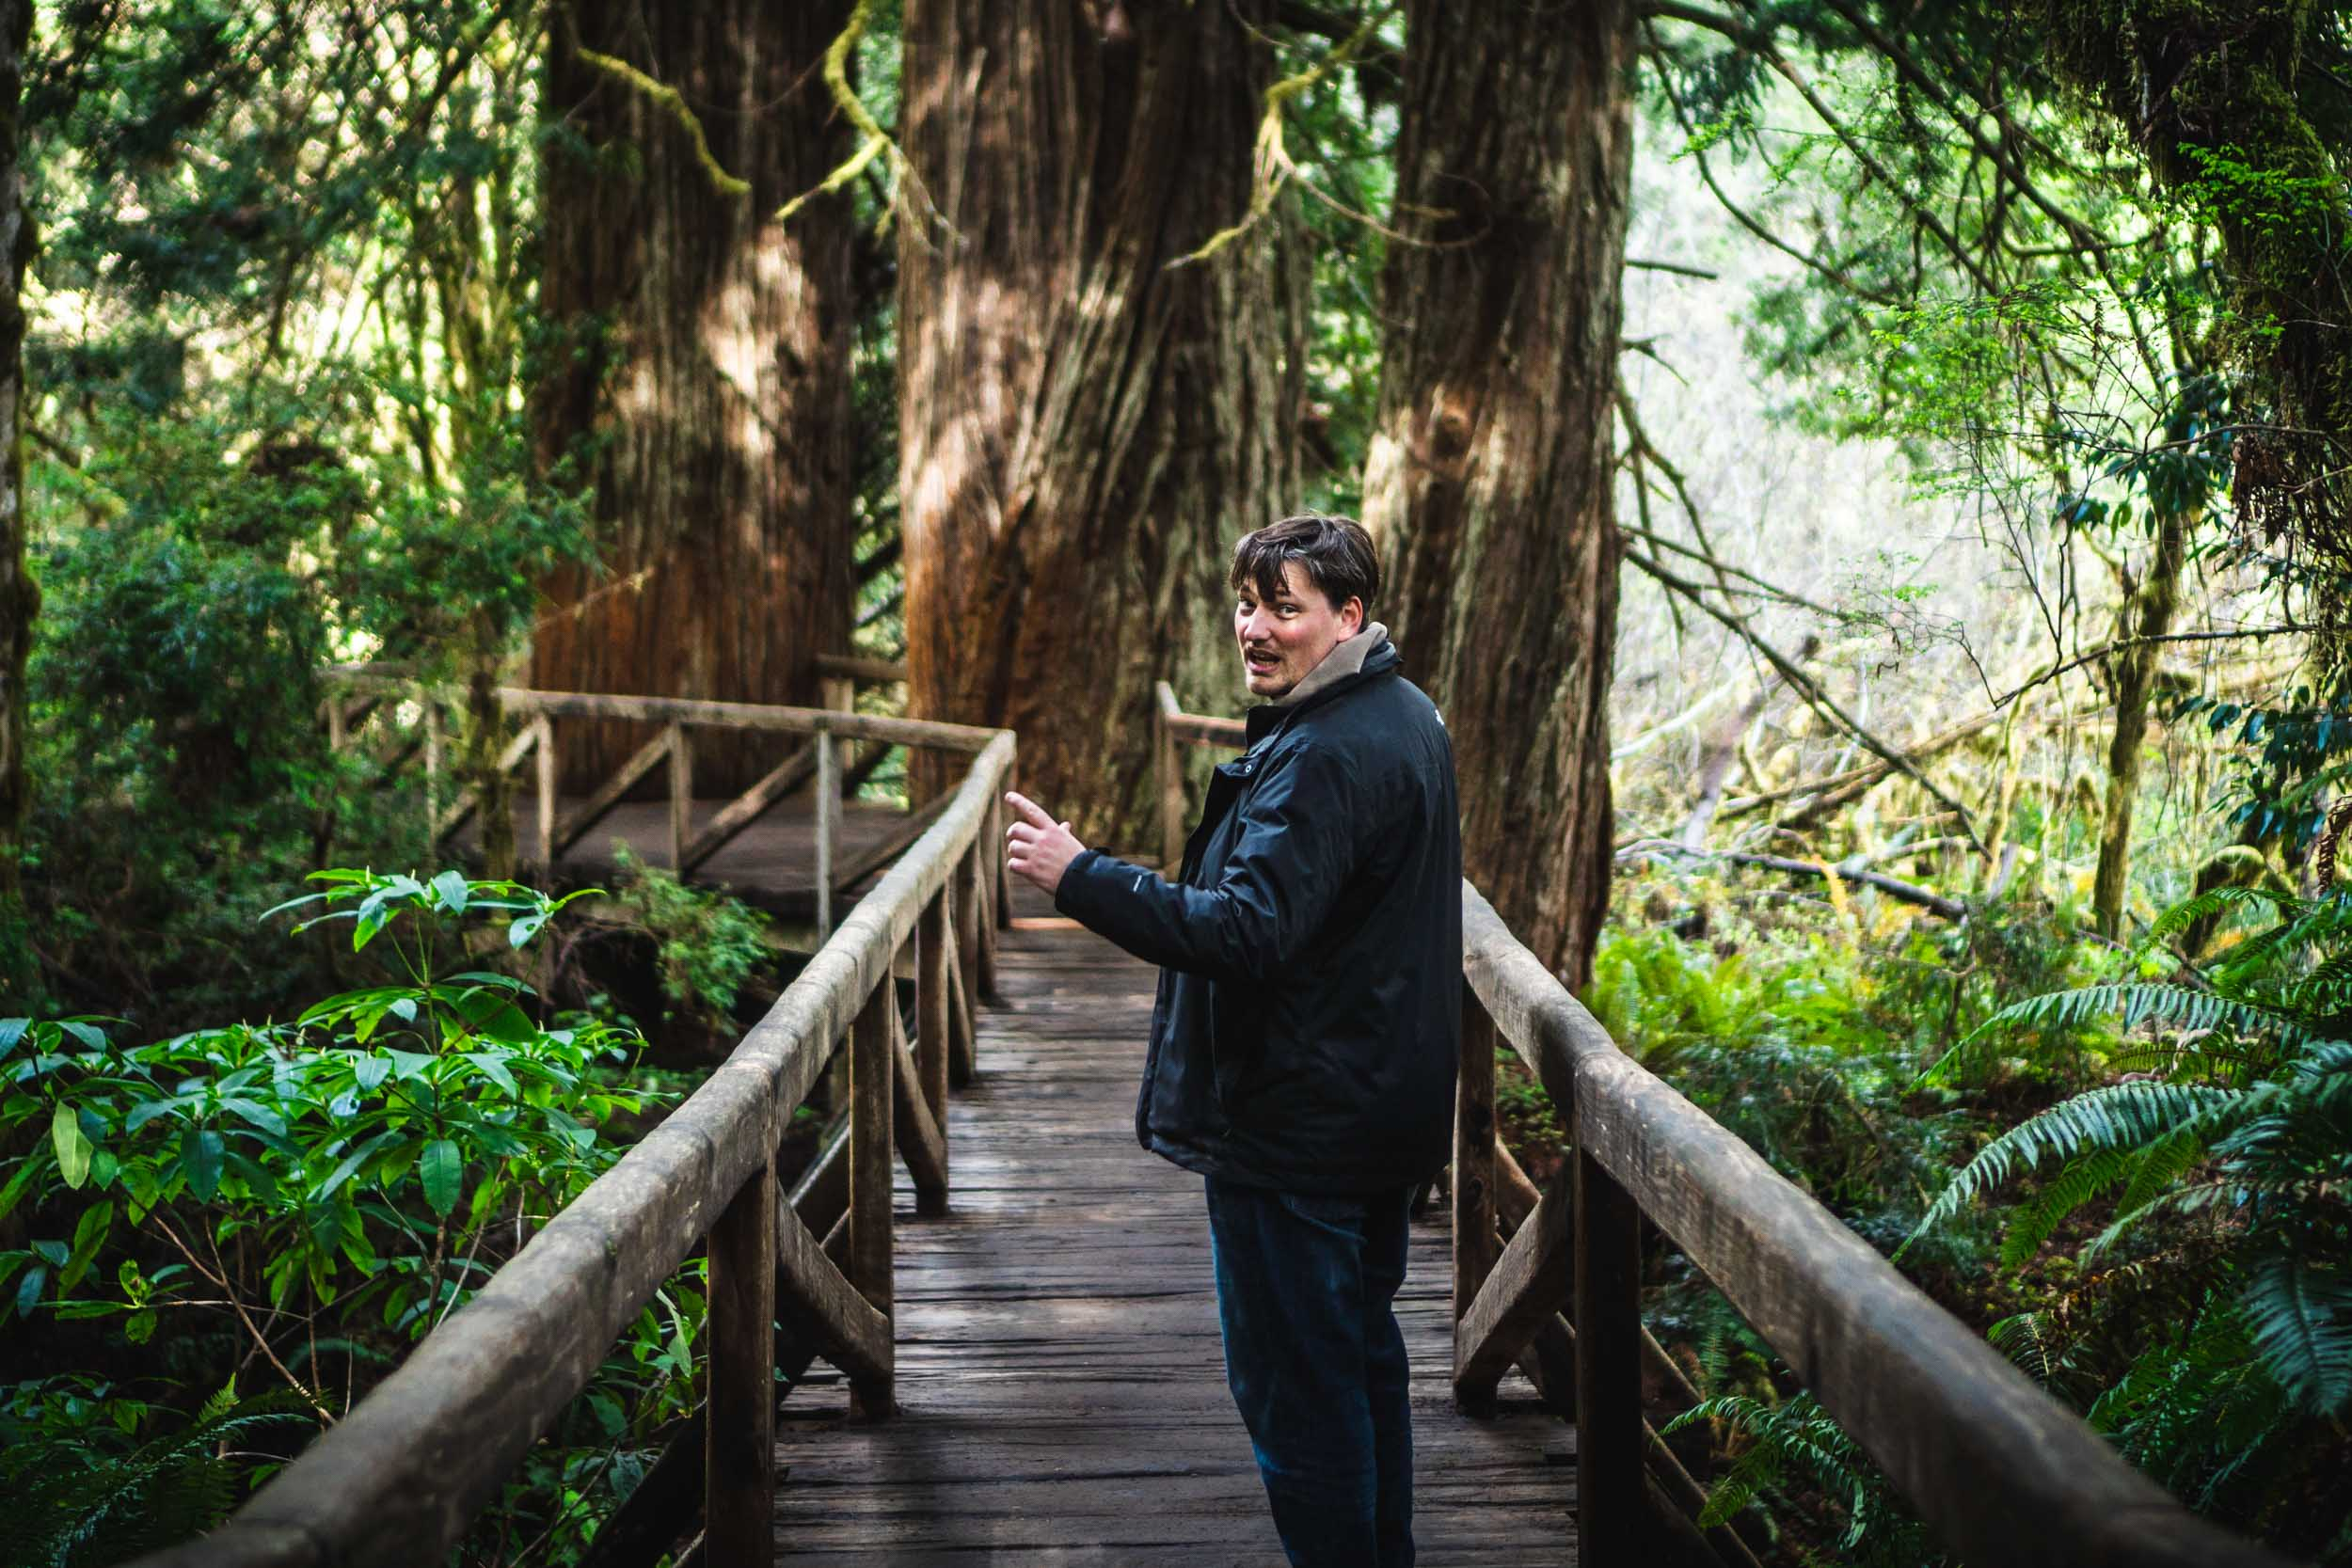 My Dutch friend, Leon The Adventurer, in the Redwoods